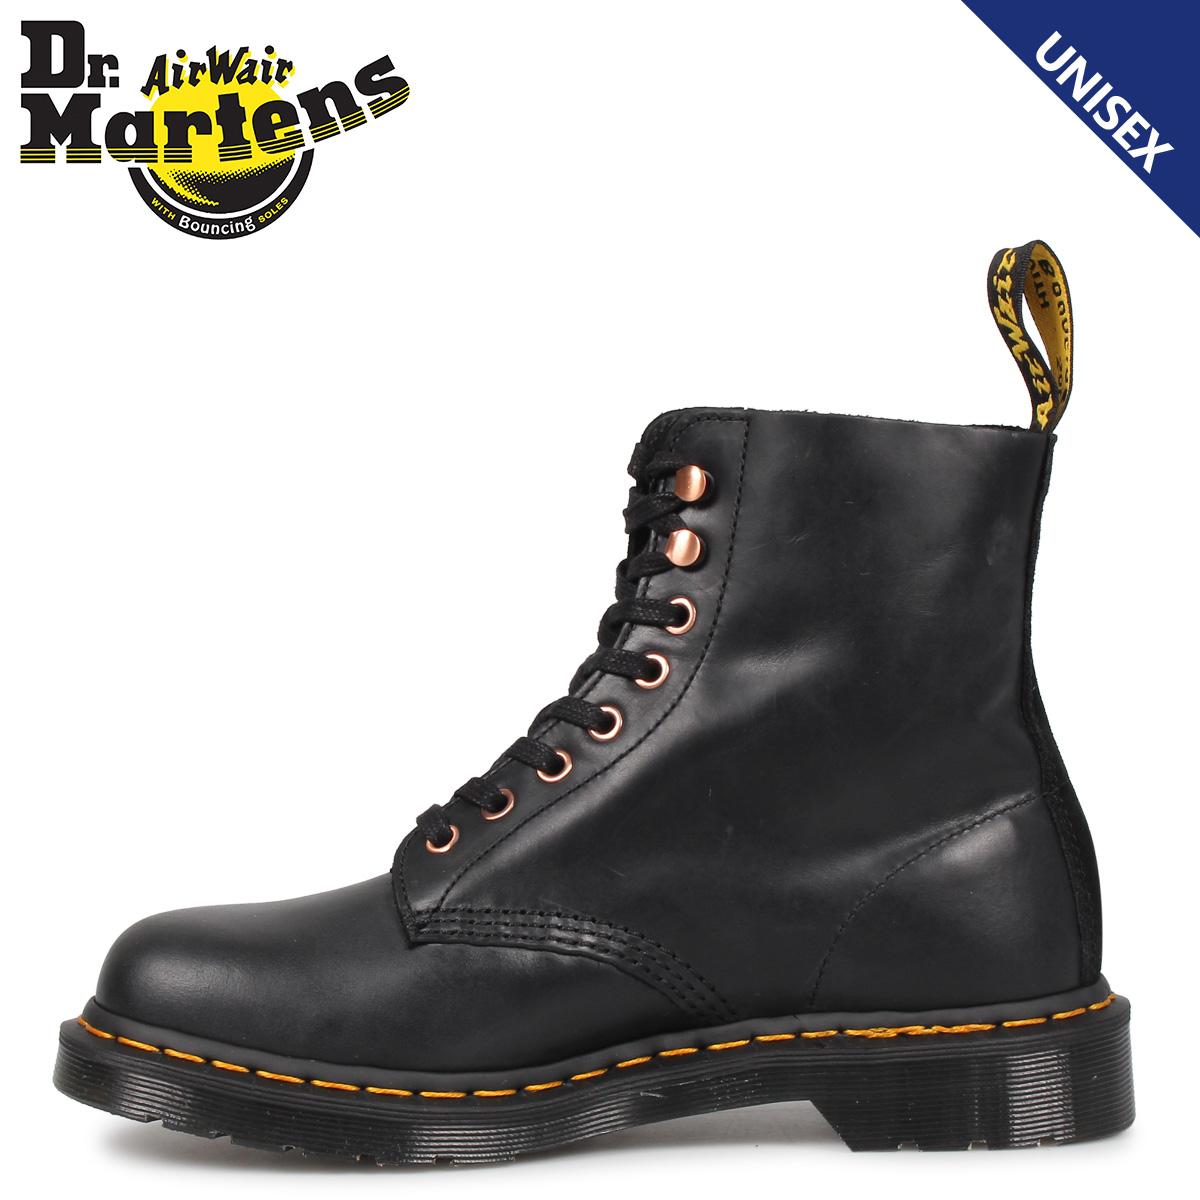 Dr.Martens ドクターマーチン 8ホール 1460 ブーツ メンズ レディース PASCAL 8EYE BOOT ブラック 黒 R25359001